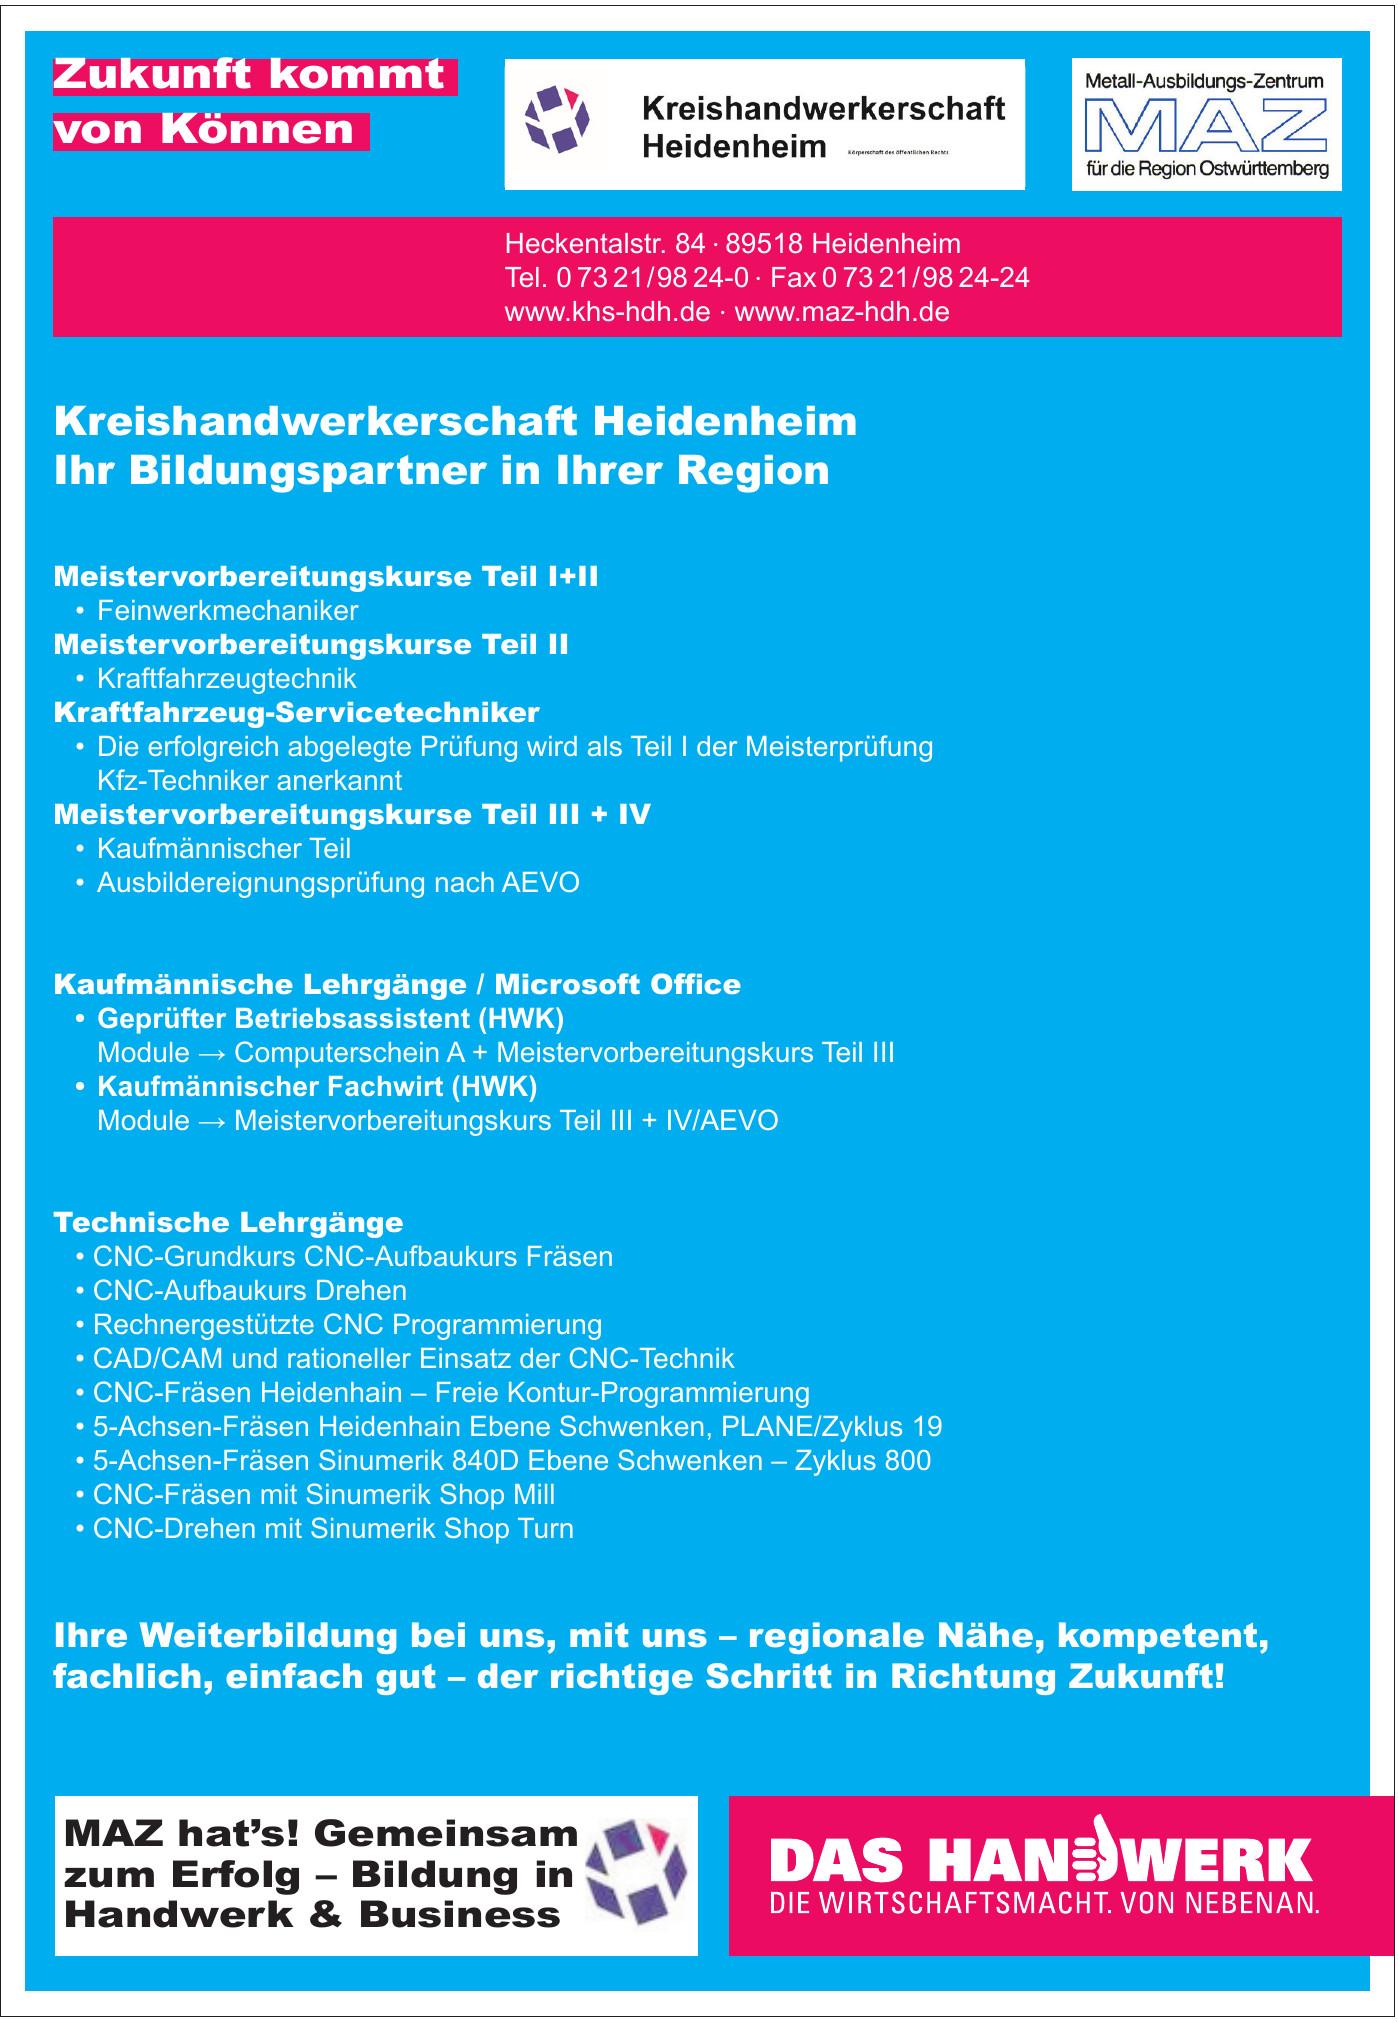 Kreishandwerkerschaft Heidenheim KdöR